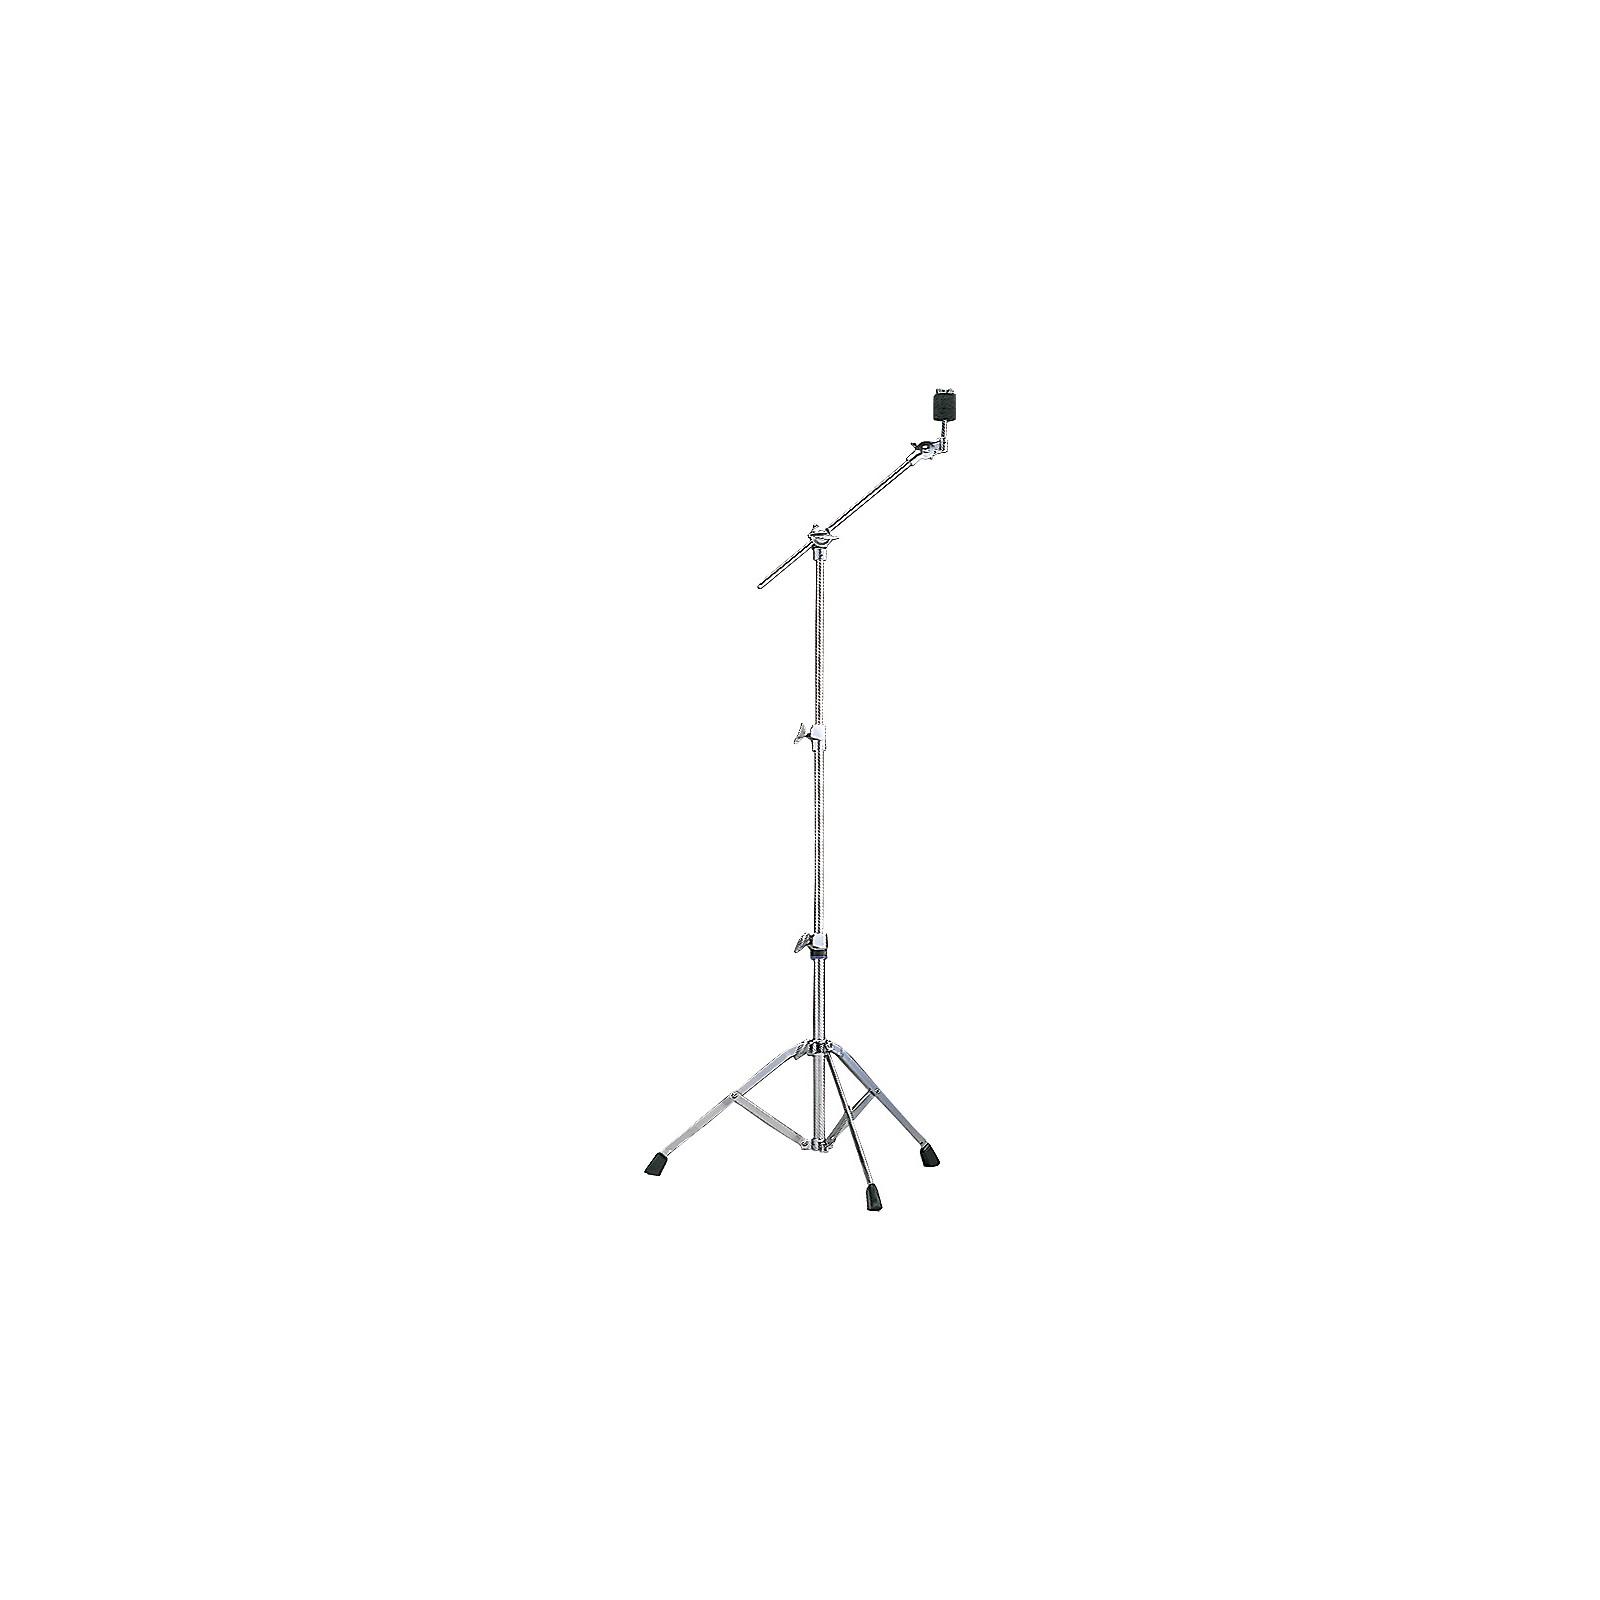 Yamaha Single-Braced Lightweight Boom Cymbal Stand